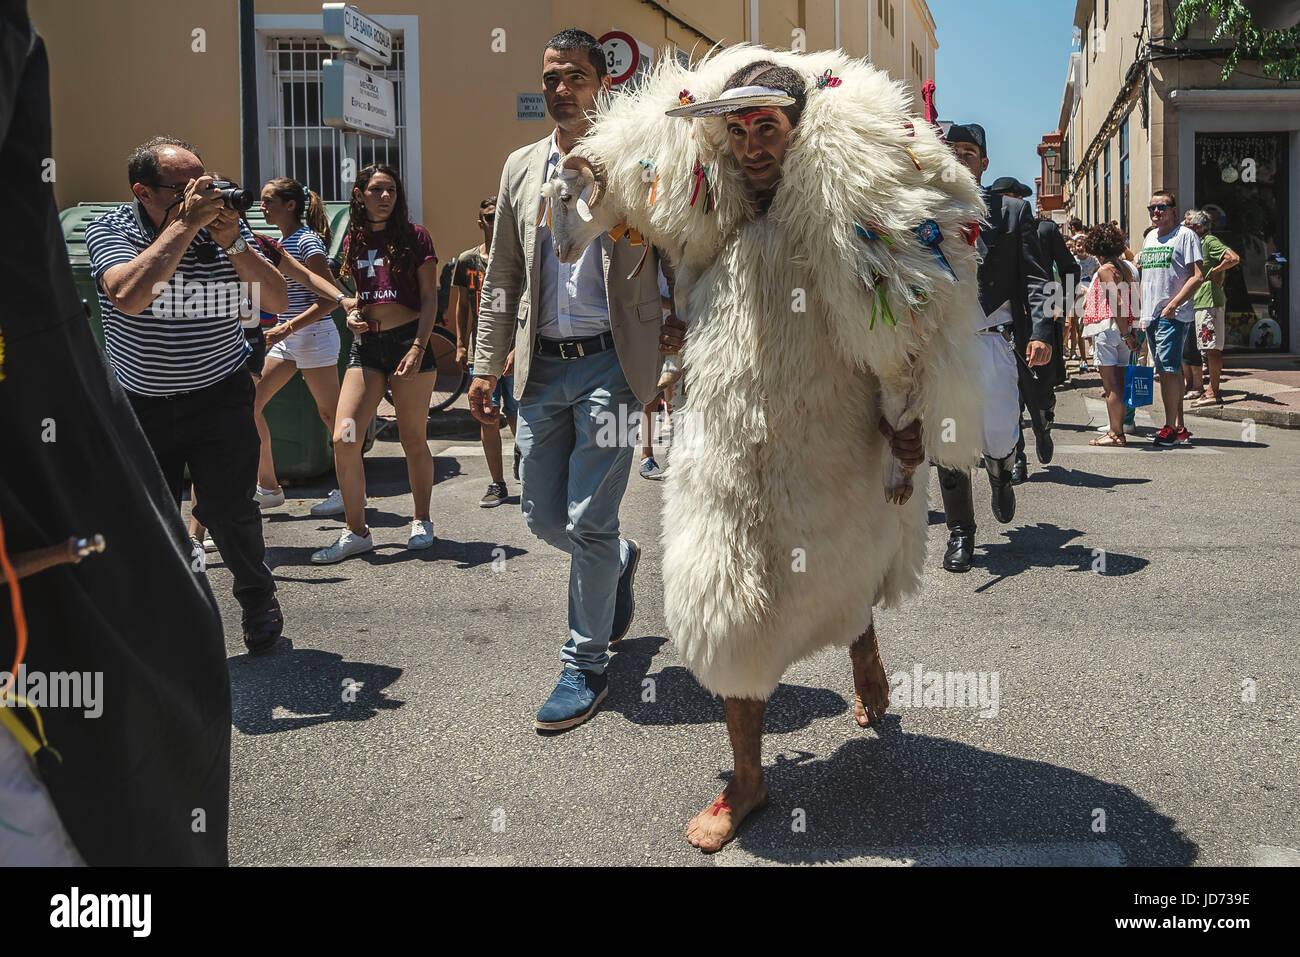 Ciutadella, Menorca. June 18th, 2017: A young man clad in a sheepskin, the 's'Homo des Be' (sheepman), - Stock Image